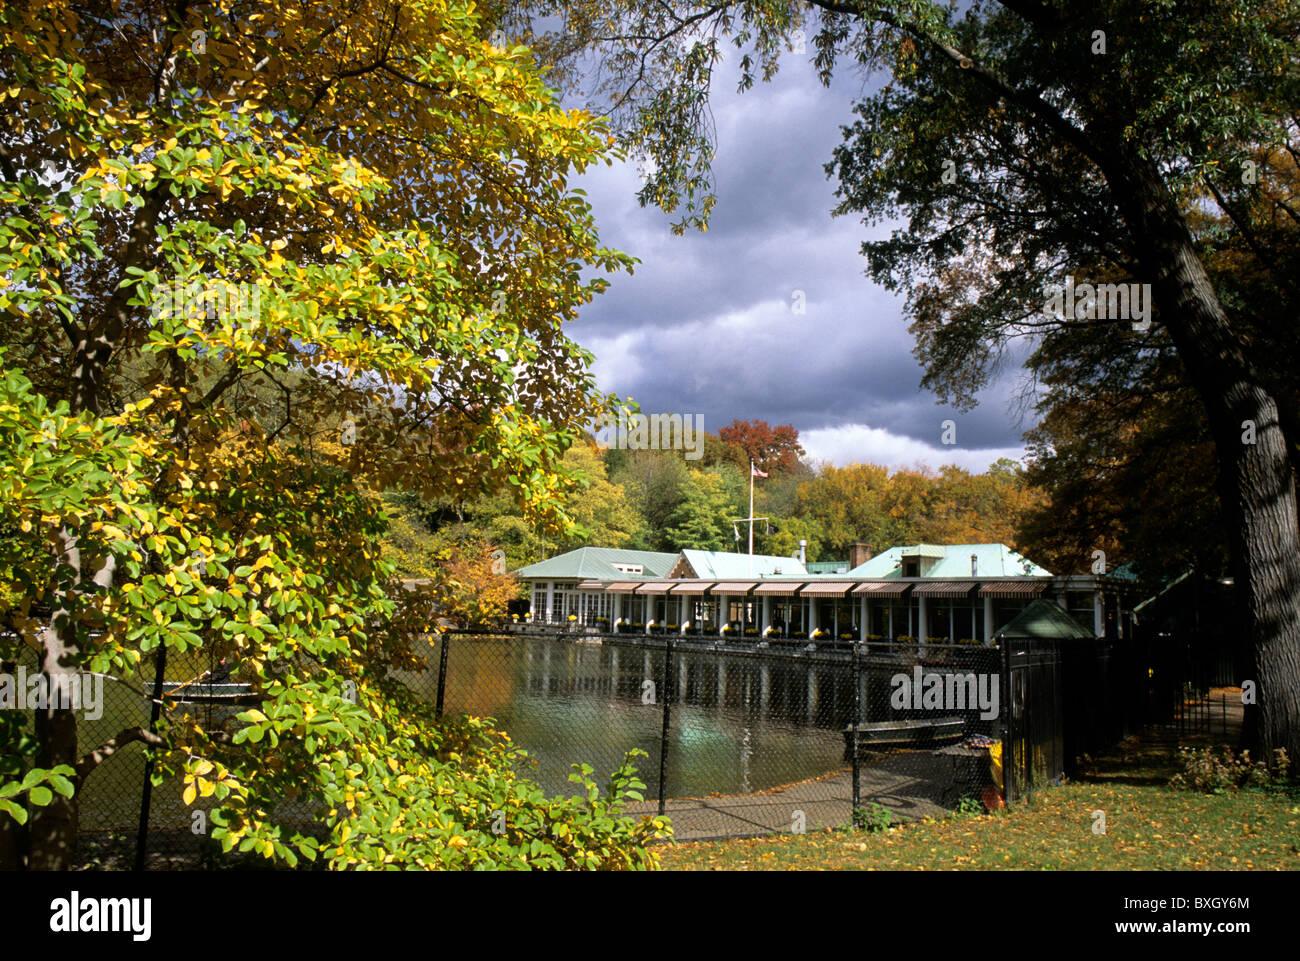 Boat Restaurant Central Park Nyc